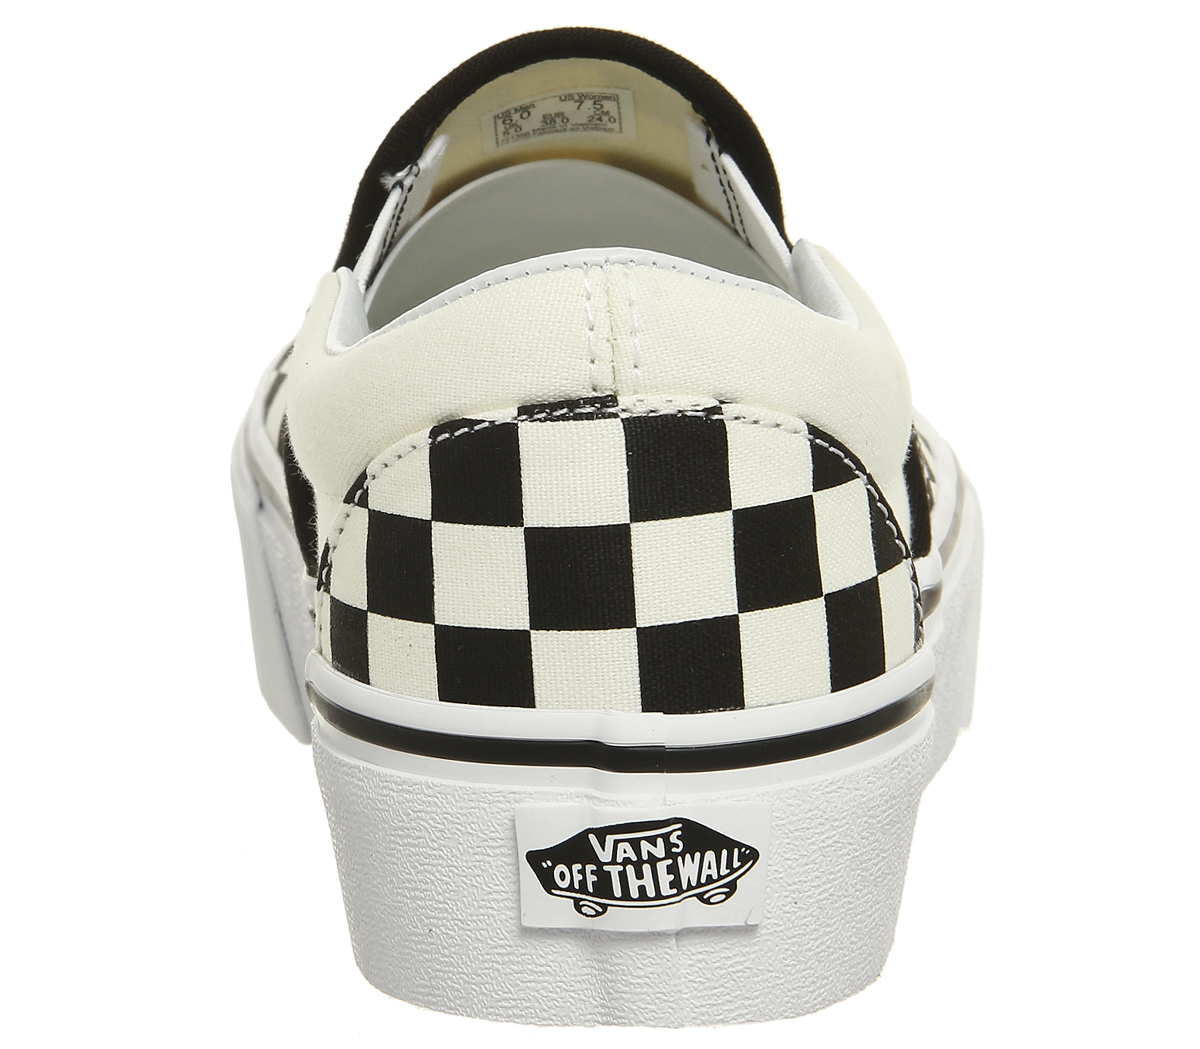 Damenschuhe Vans Classic Slip On Platform Trainers BLACK WEISS CHECKER Trainers Schuhes